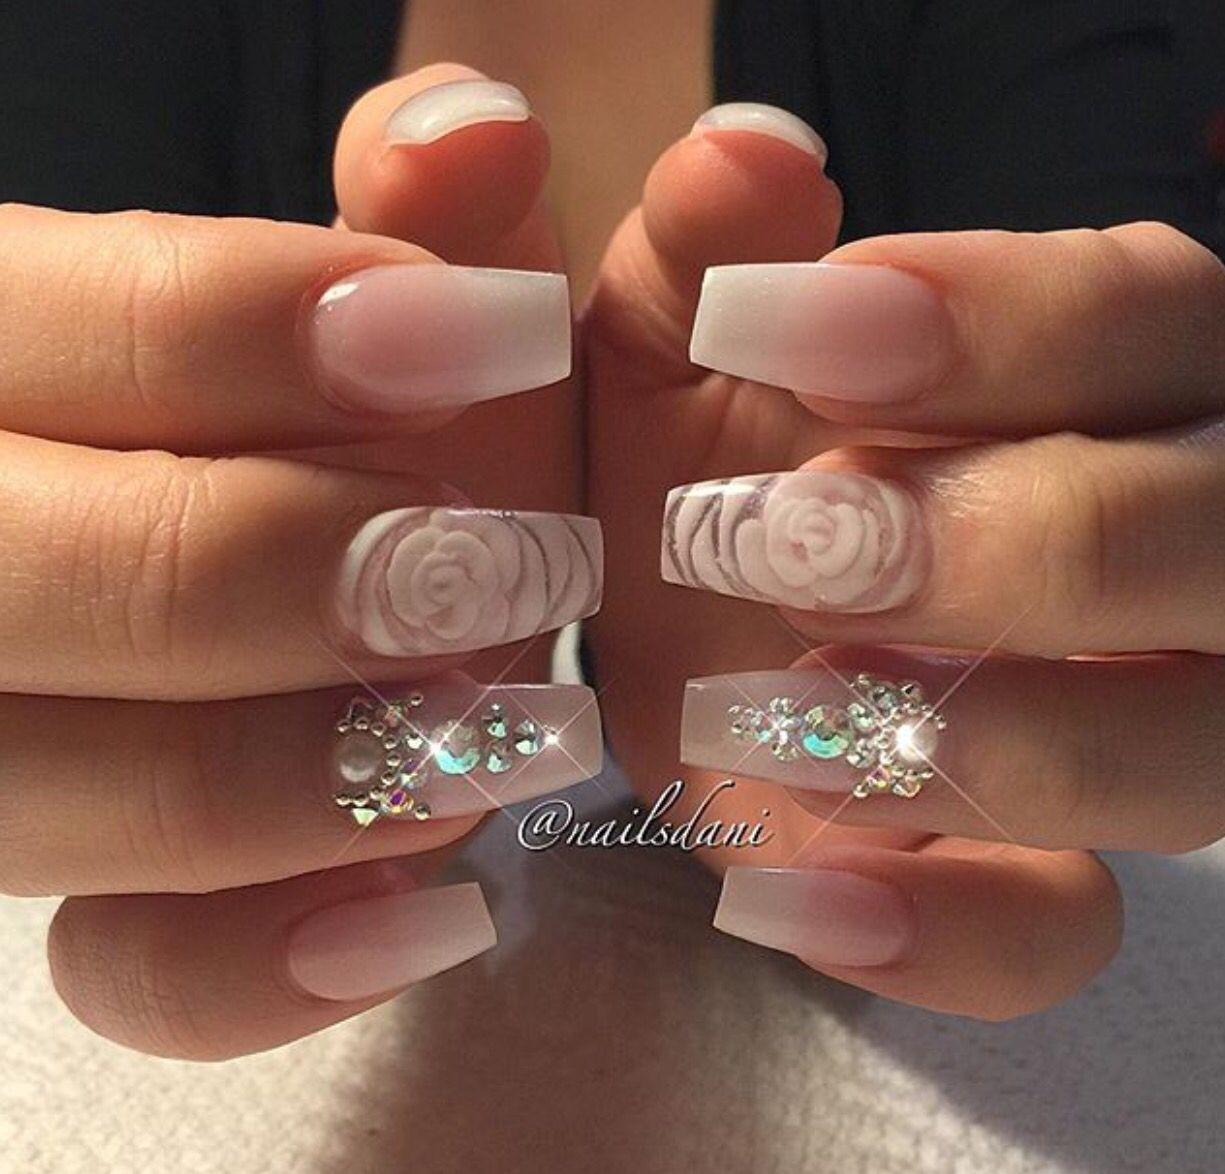 Rhinestones Flower Nails Nails Design With Rhinestones Nail Designs Bling Nails